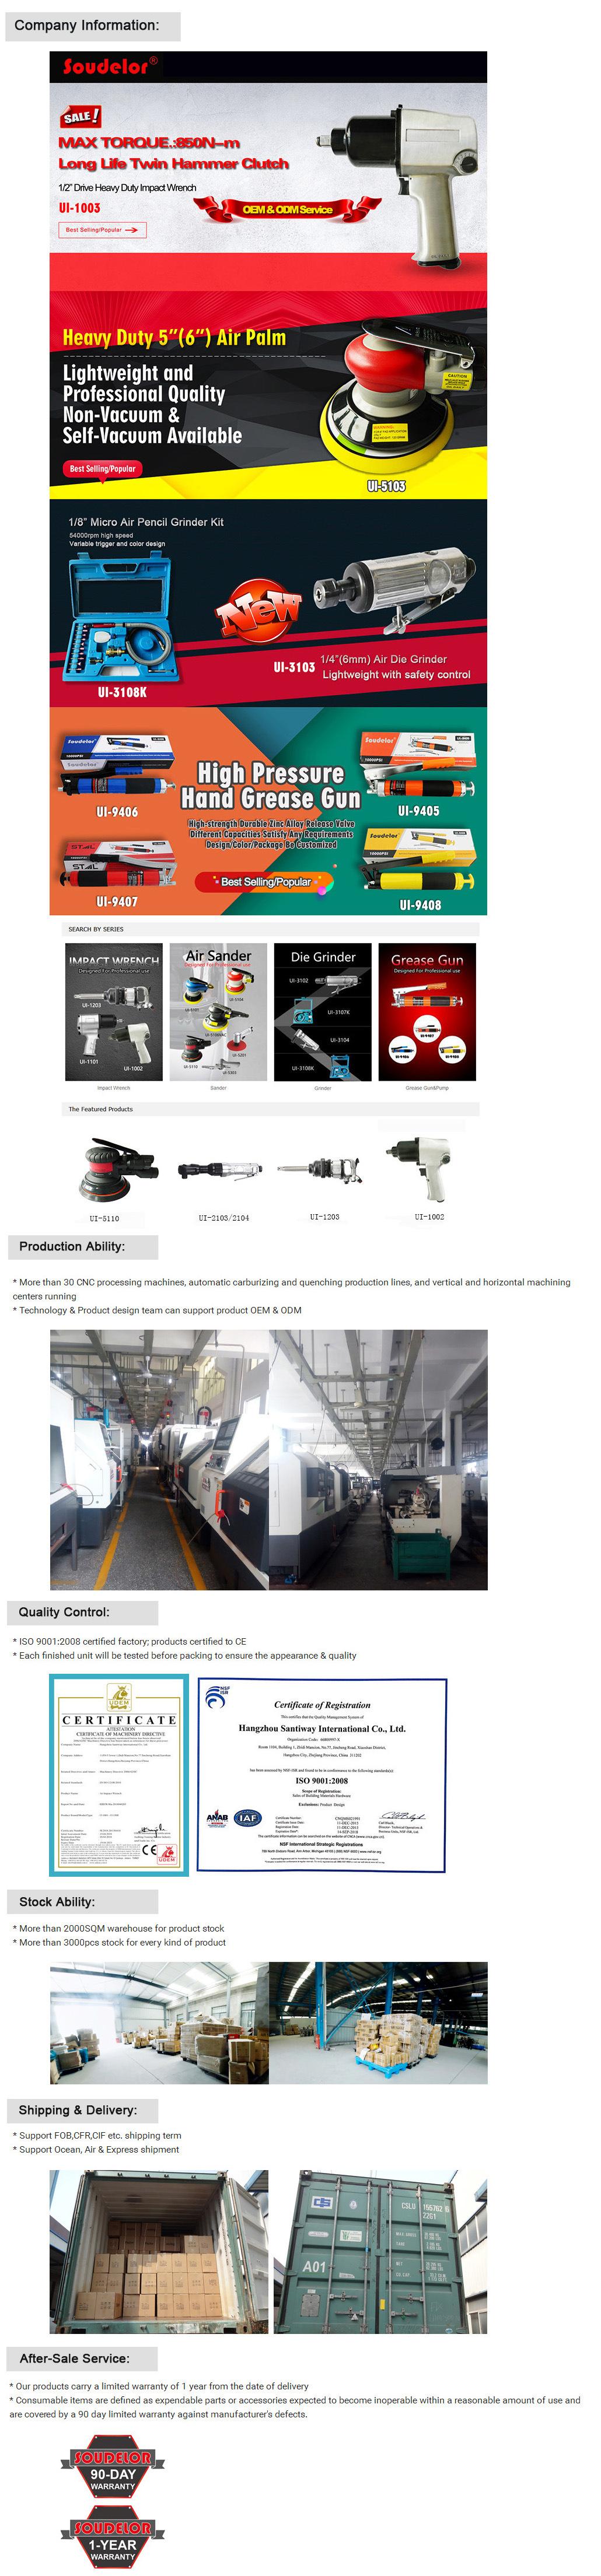 400cc High Pressure Hand Manual Grease Gun 10000psi